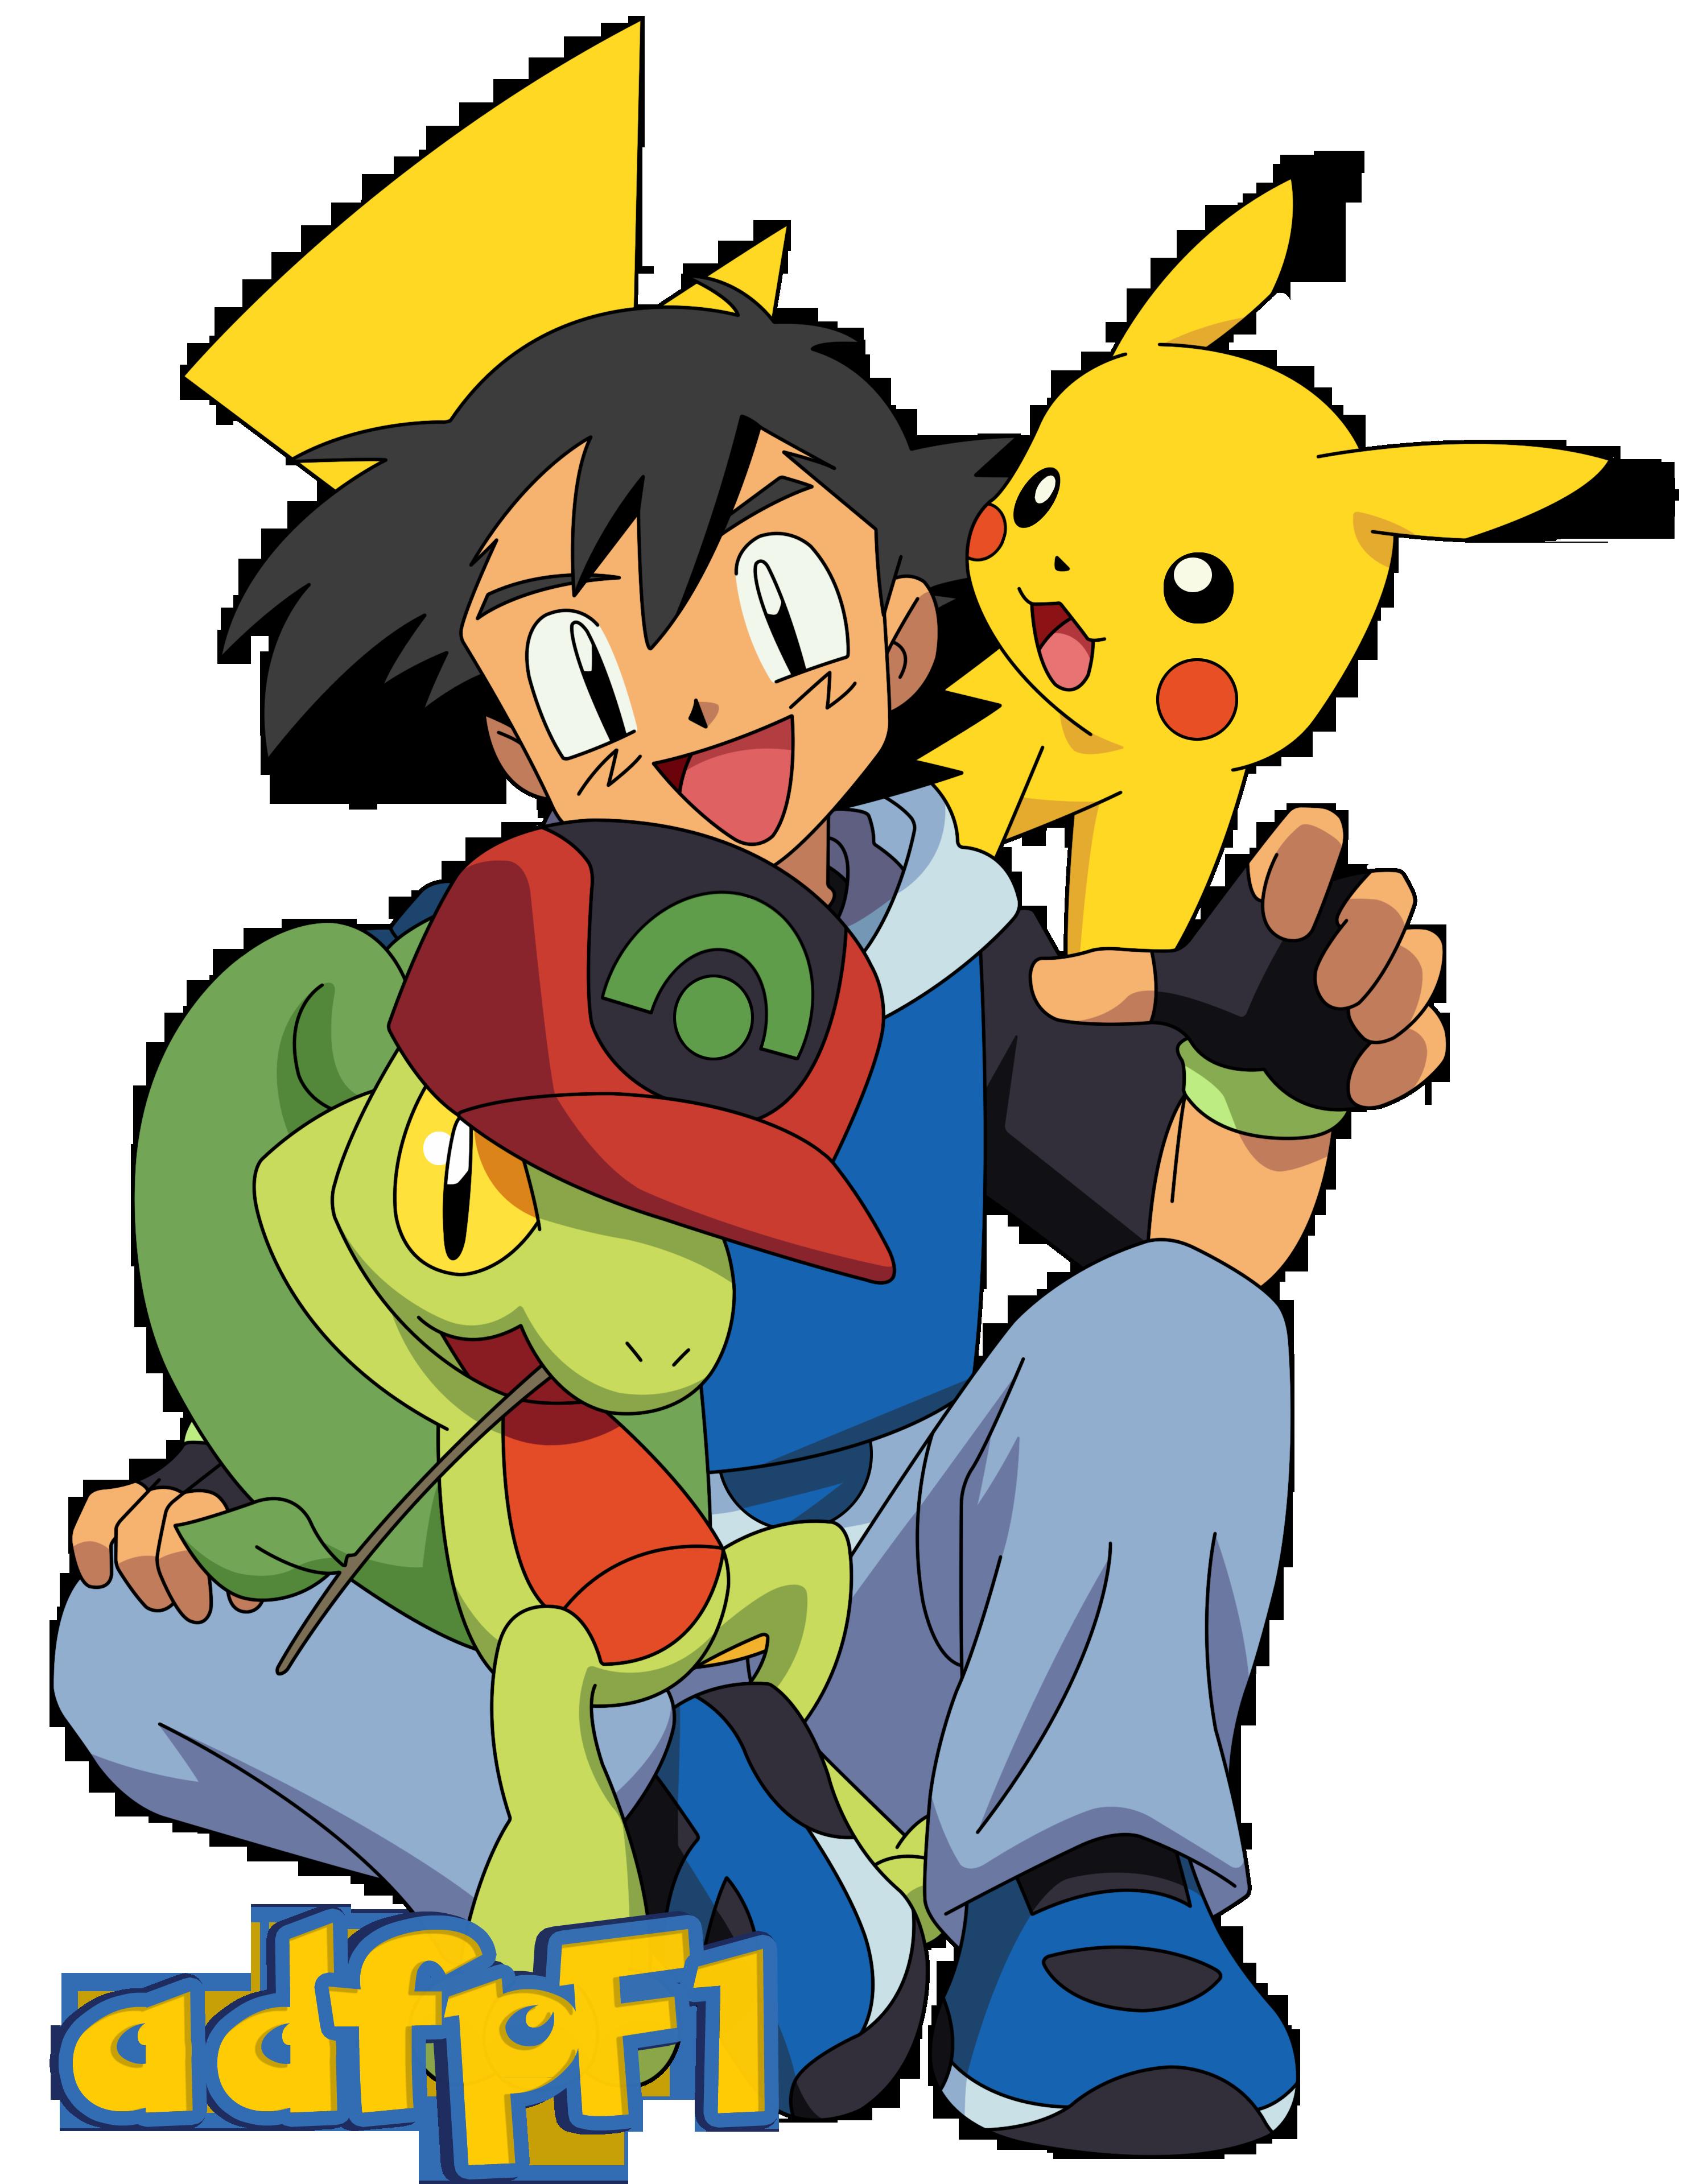 Ash (AG), Pikachu Y Treecko (01) By AdfpF1.deviantart.com